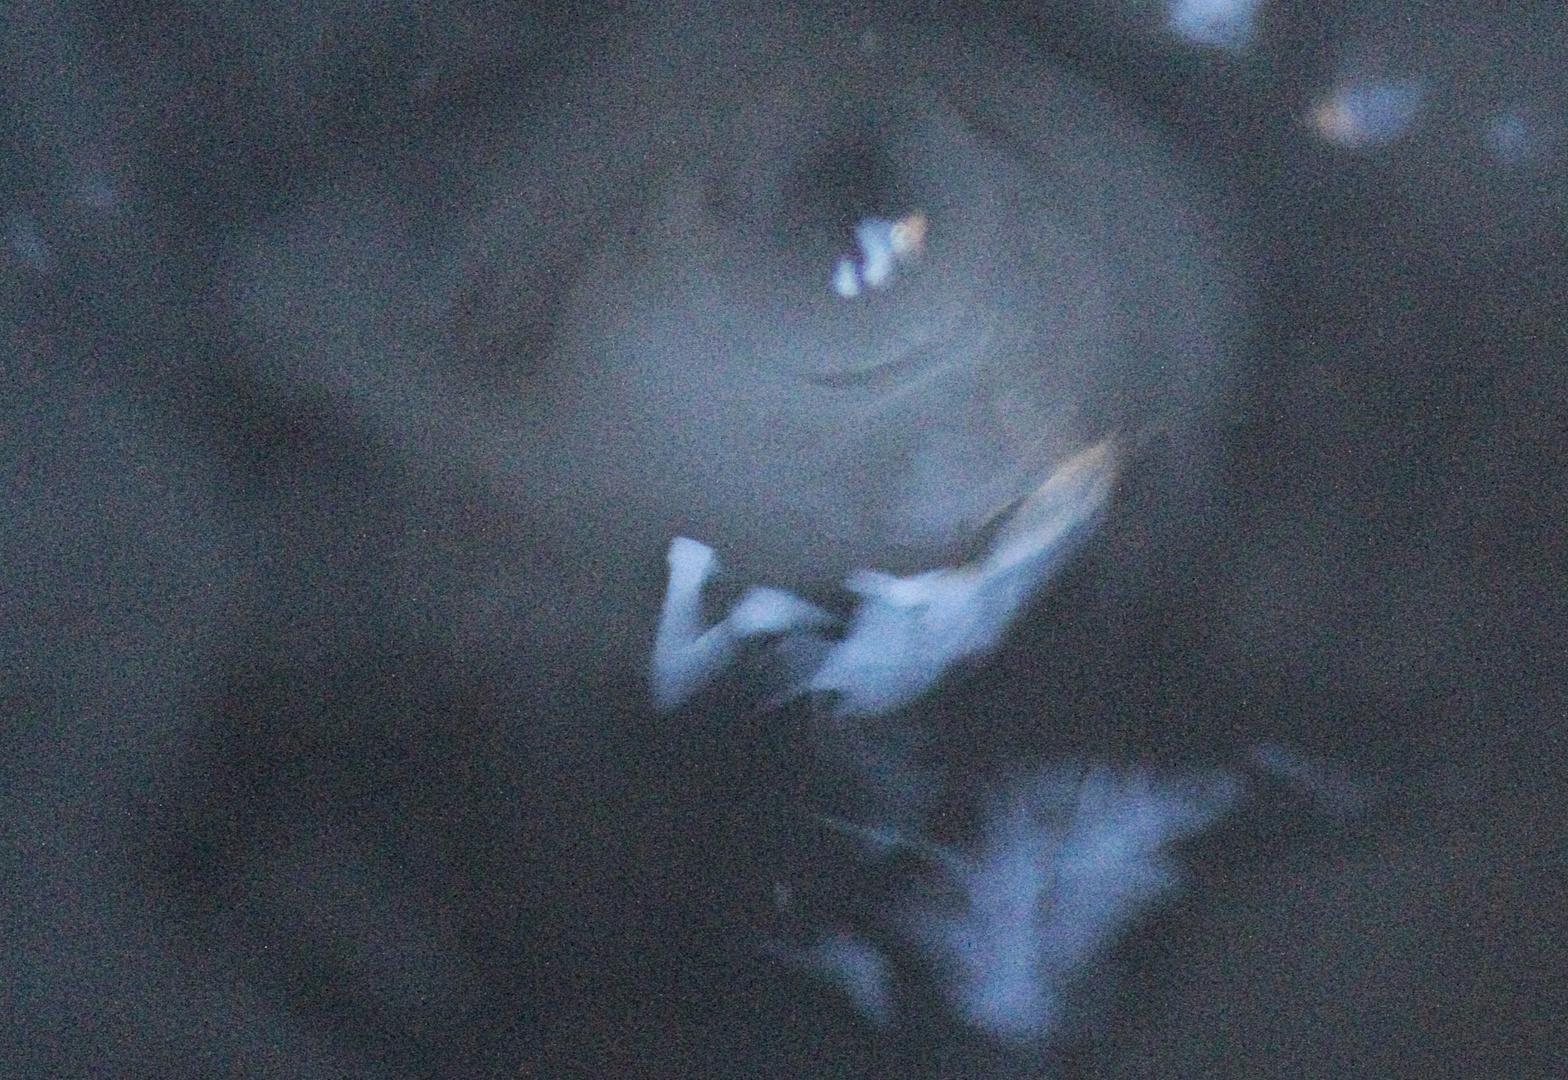 Phantomas eye